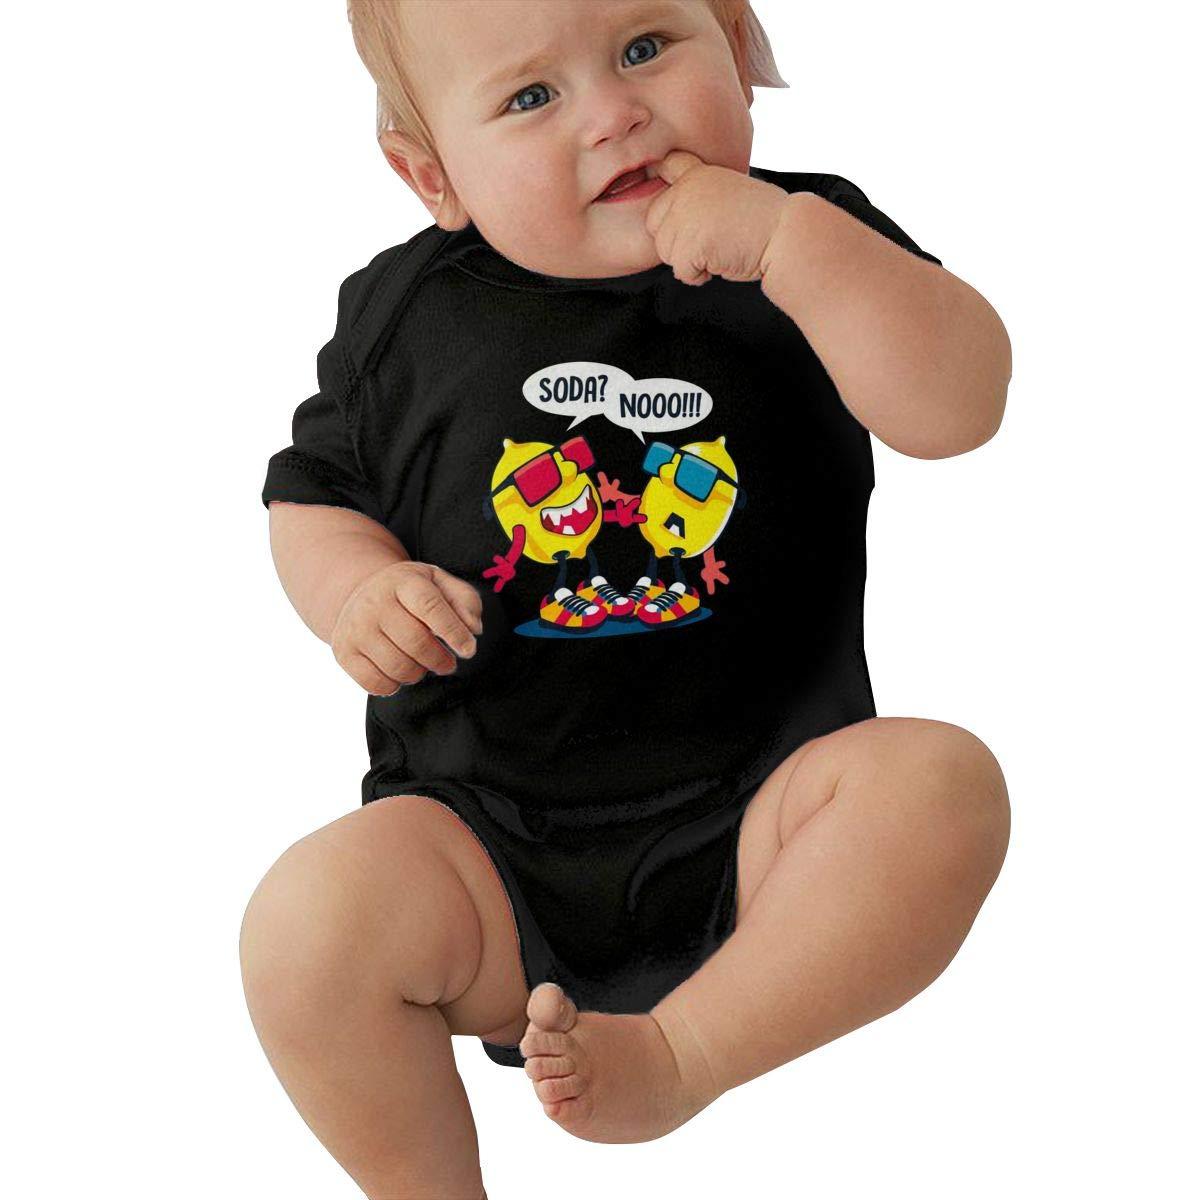 LuYiDa Unisex Baby Crew Neck Short-Sleeve Bodysuit Personification Lemon Funny Crawling Suit Black